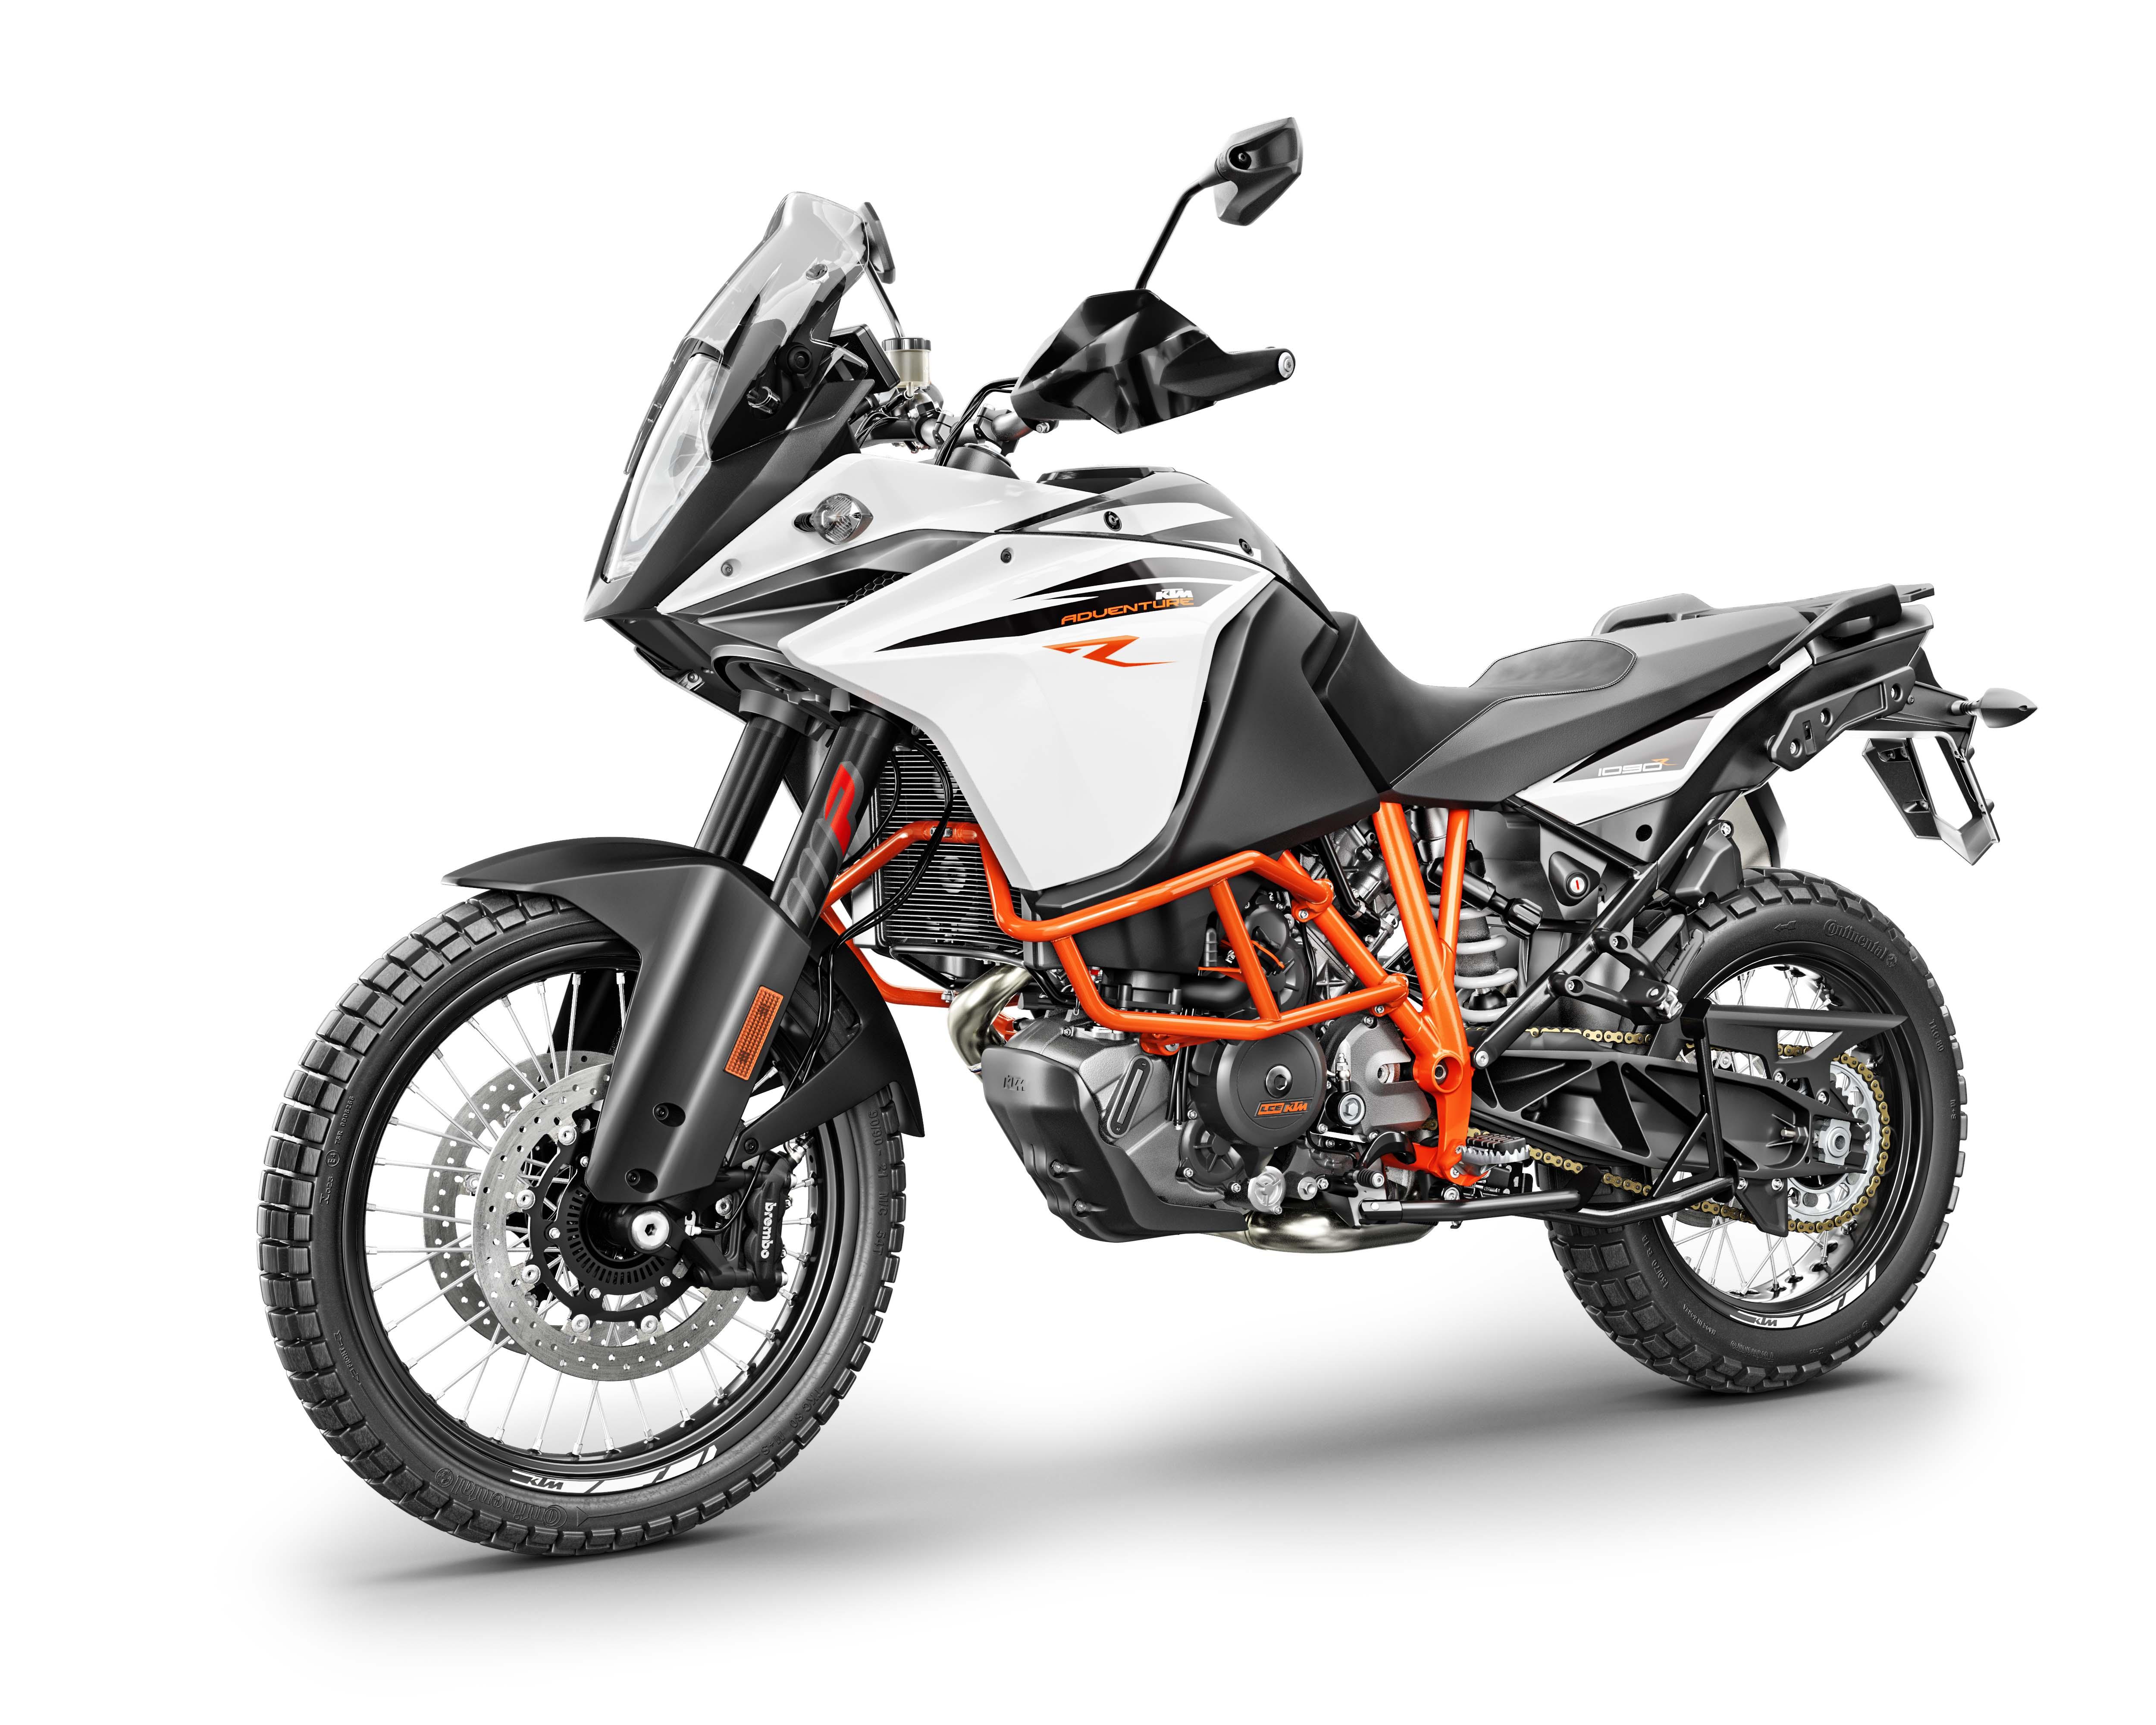 ktm 1090 adventure r a milder insane adv bike asphalt rubber